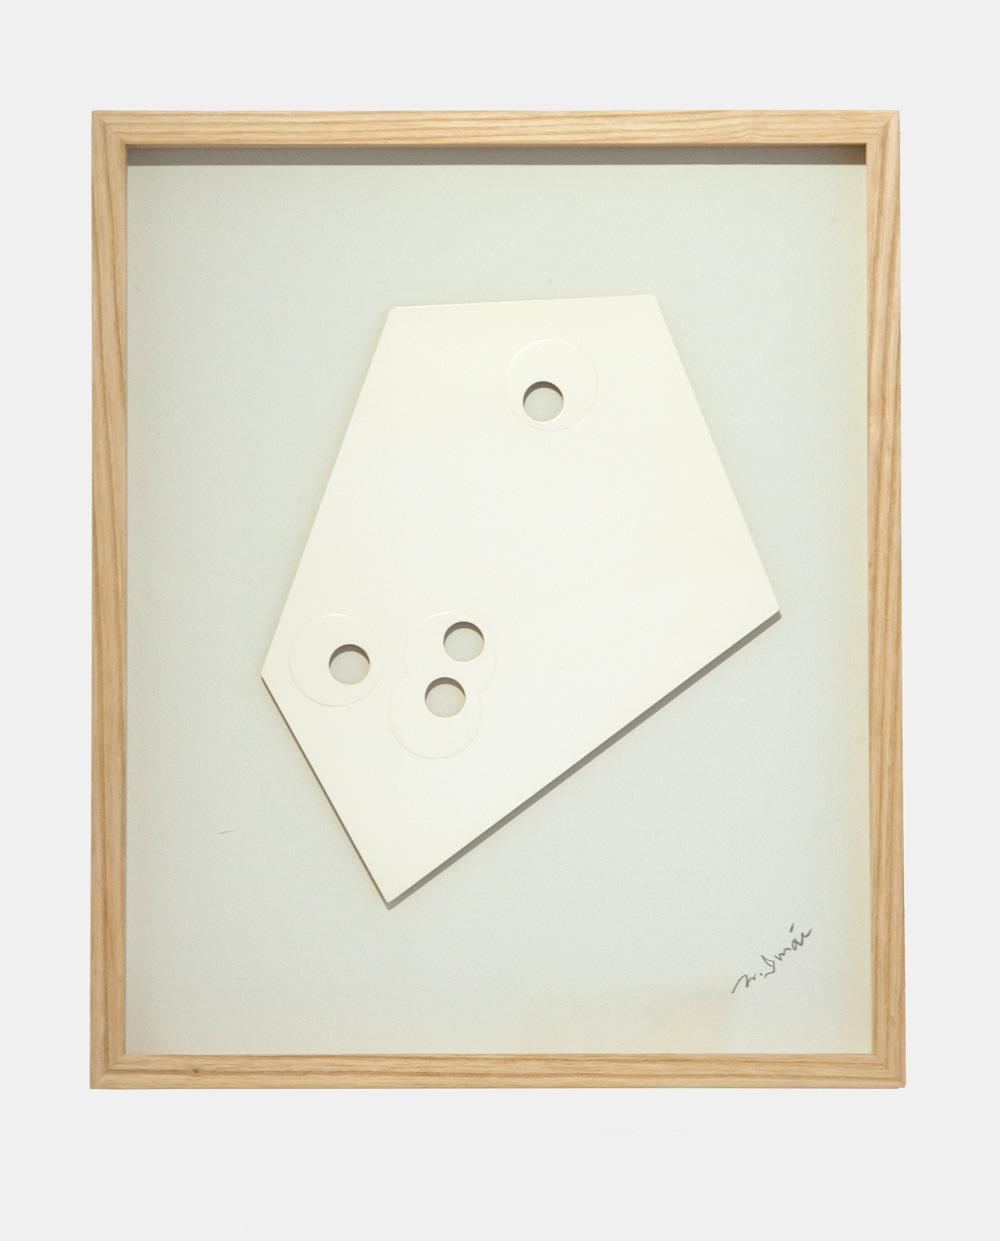 Norio Imai   White piece-A,  1966  emboss, punching, paper  44cm × 36.5cm × 3.3cm (frame)